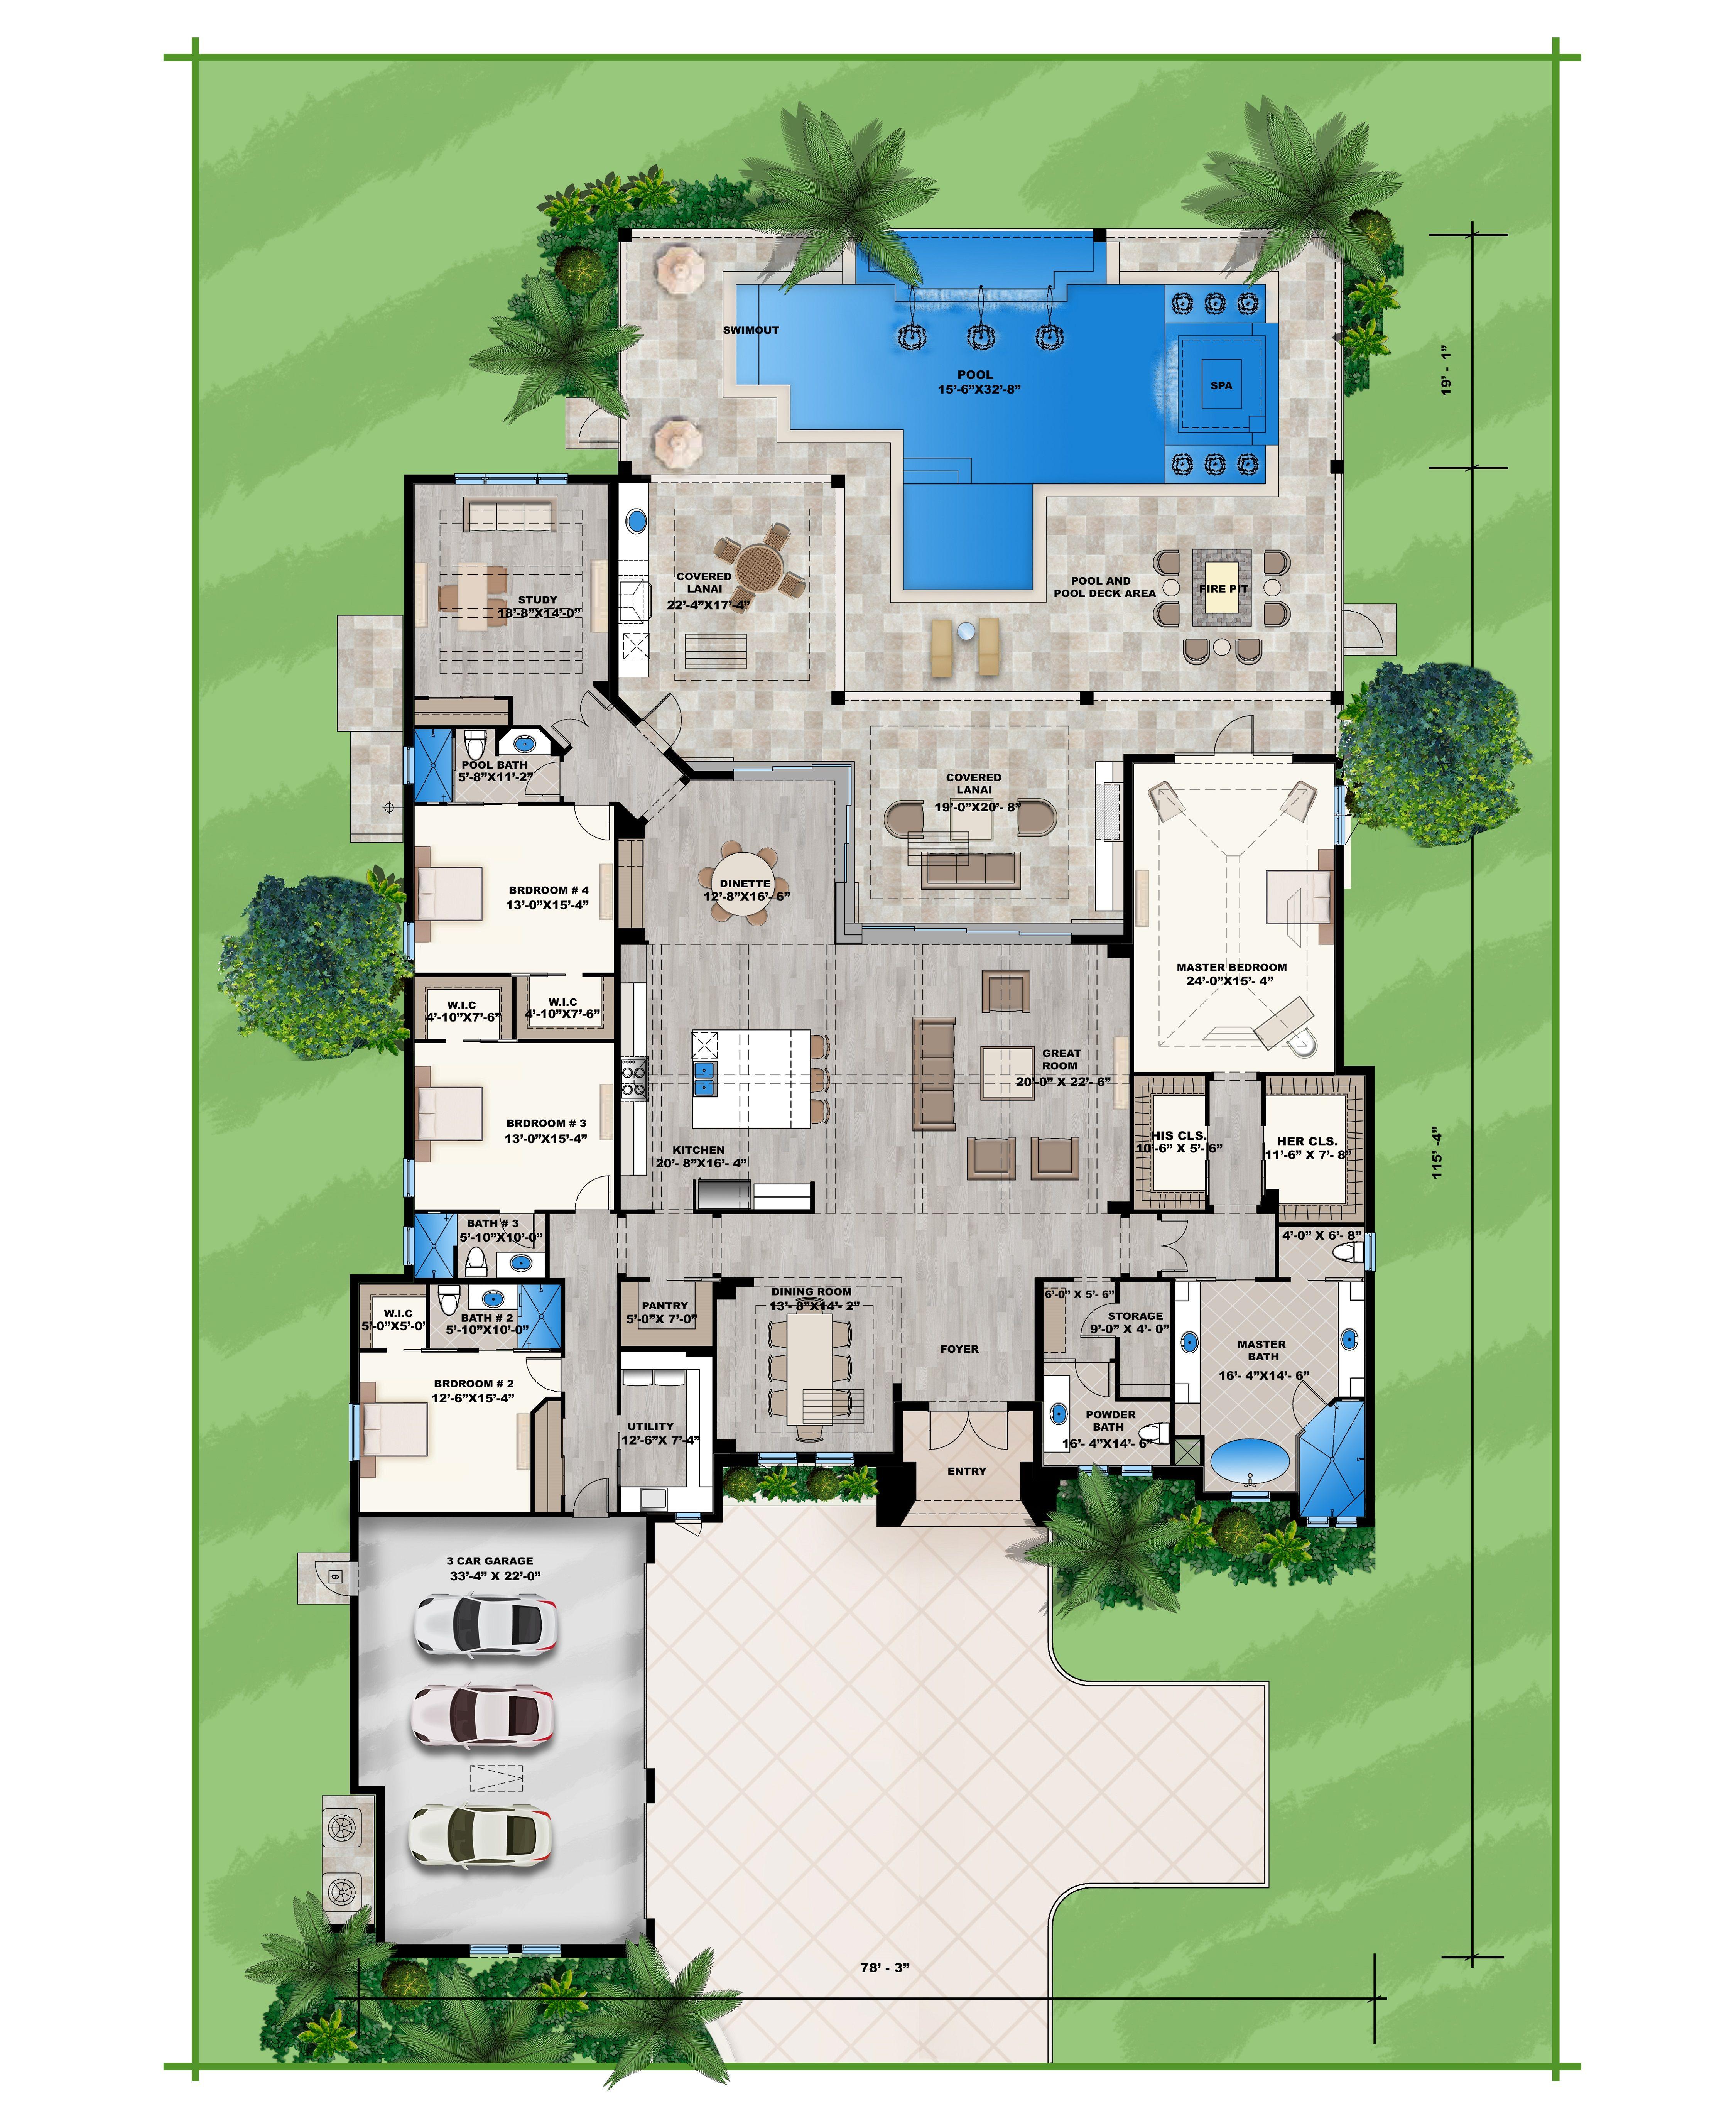 Lamora Floor Plan Jpg 4 500 5 500 Pixels Floor Plans House Blueprints Custom Home Builders